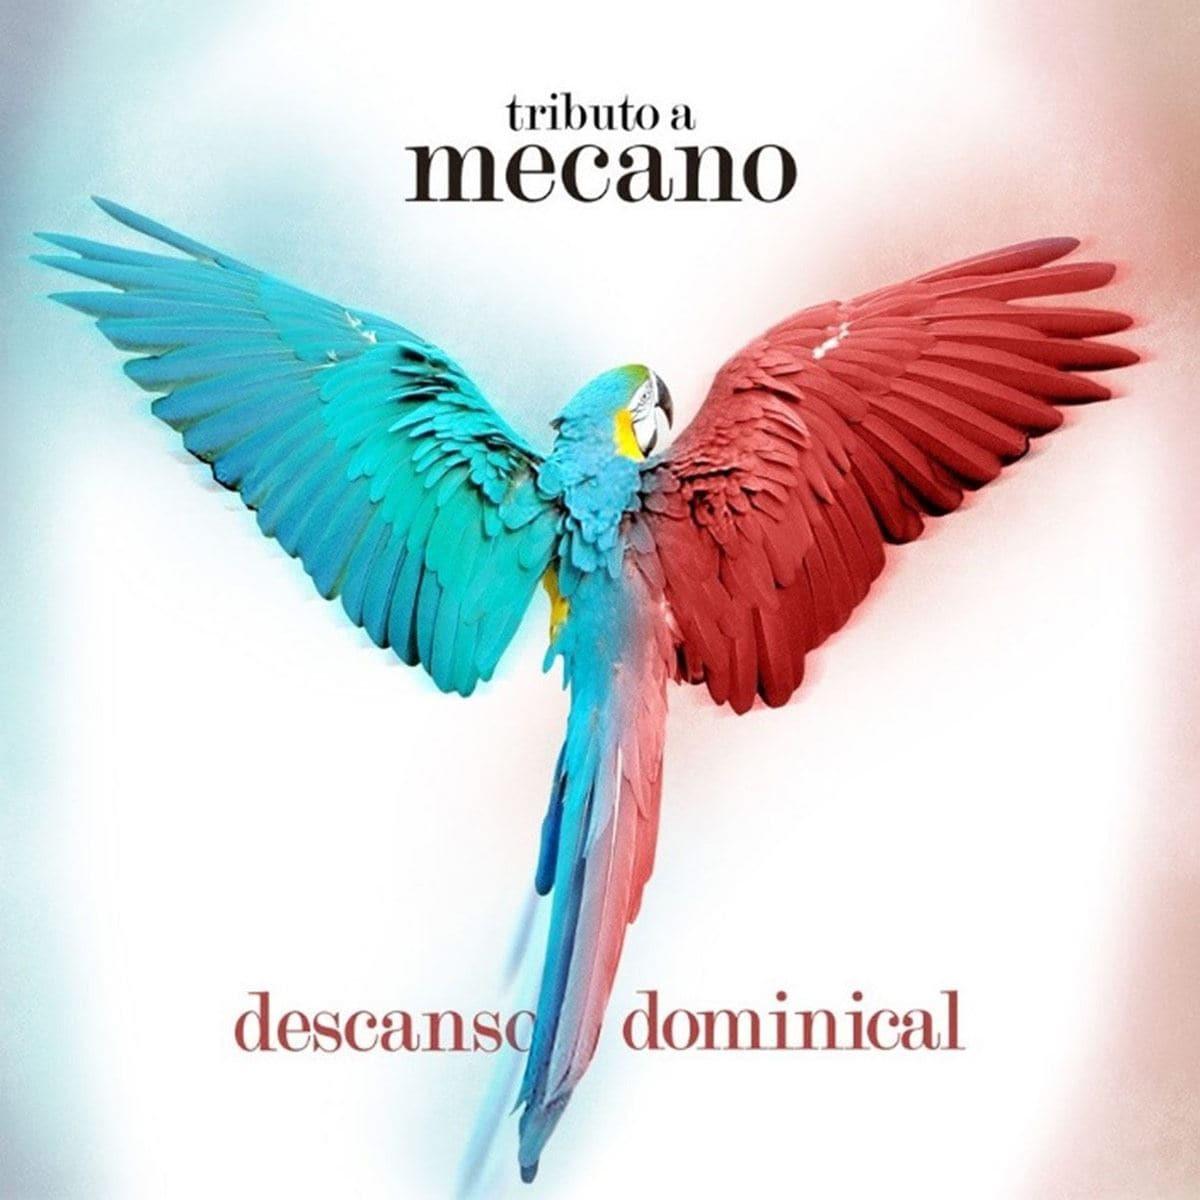 CD Tributo a Mecano- Descanso Dominical